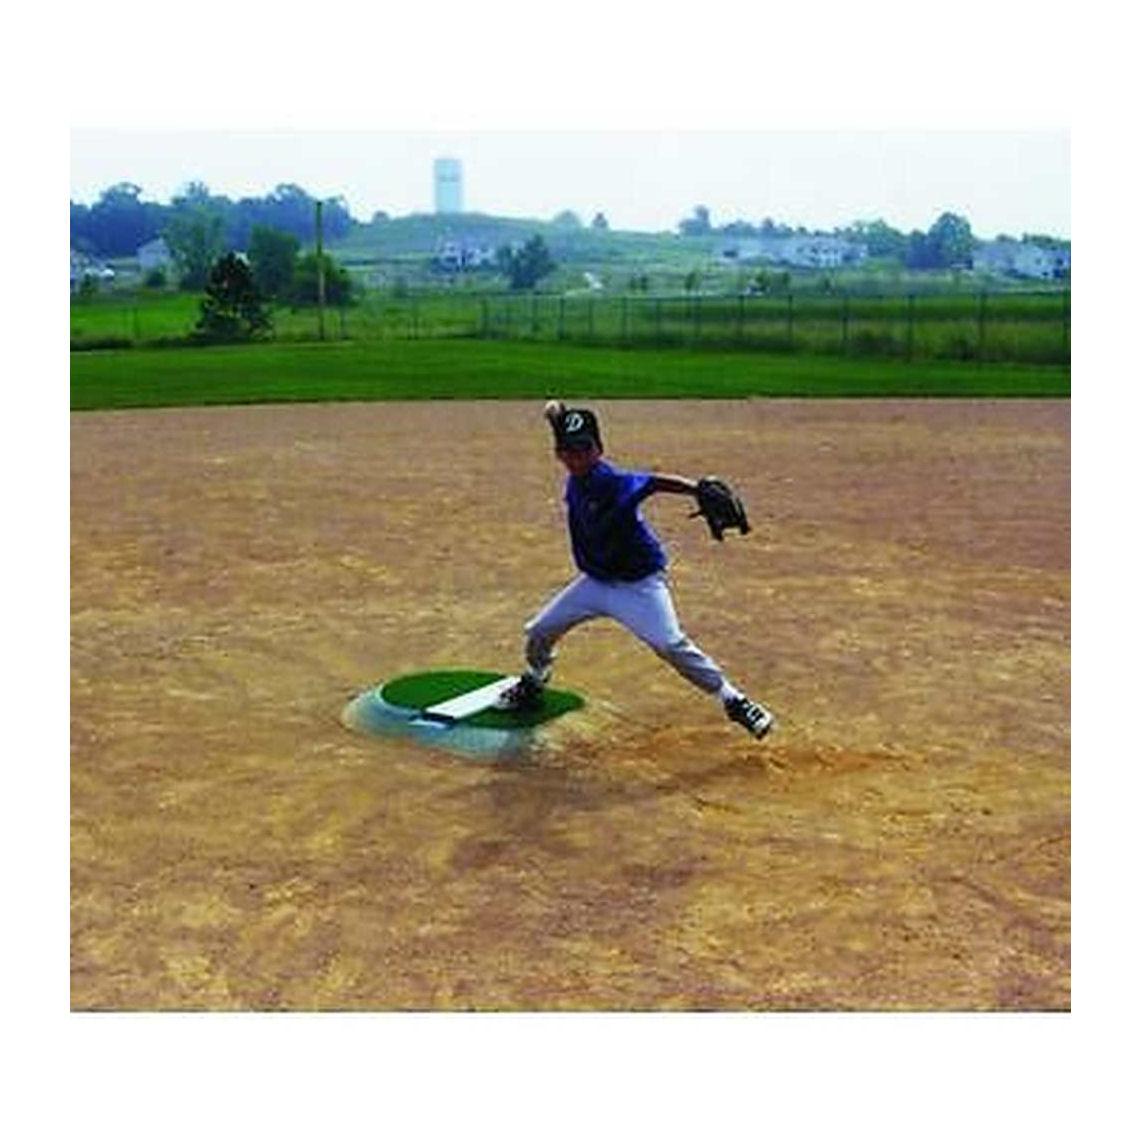 "Portolite Economy 4"" Youth Portable Baseball Pitching"